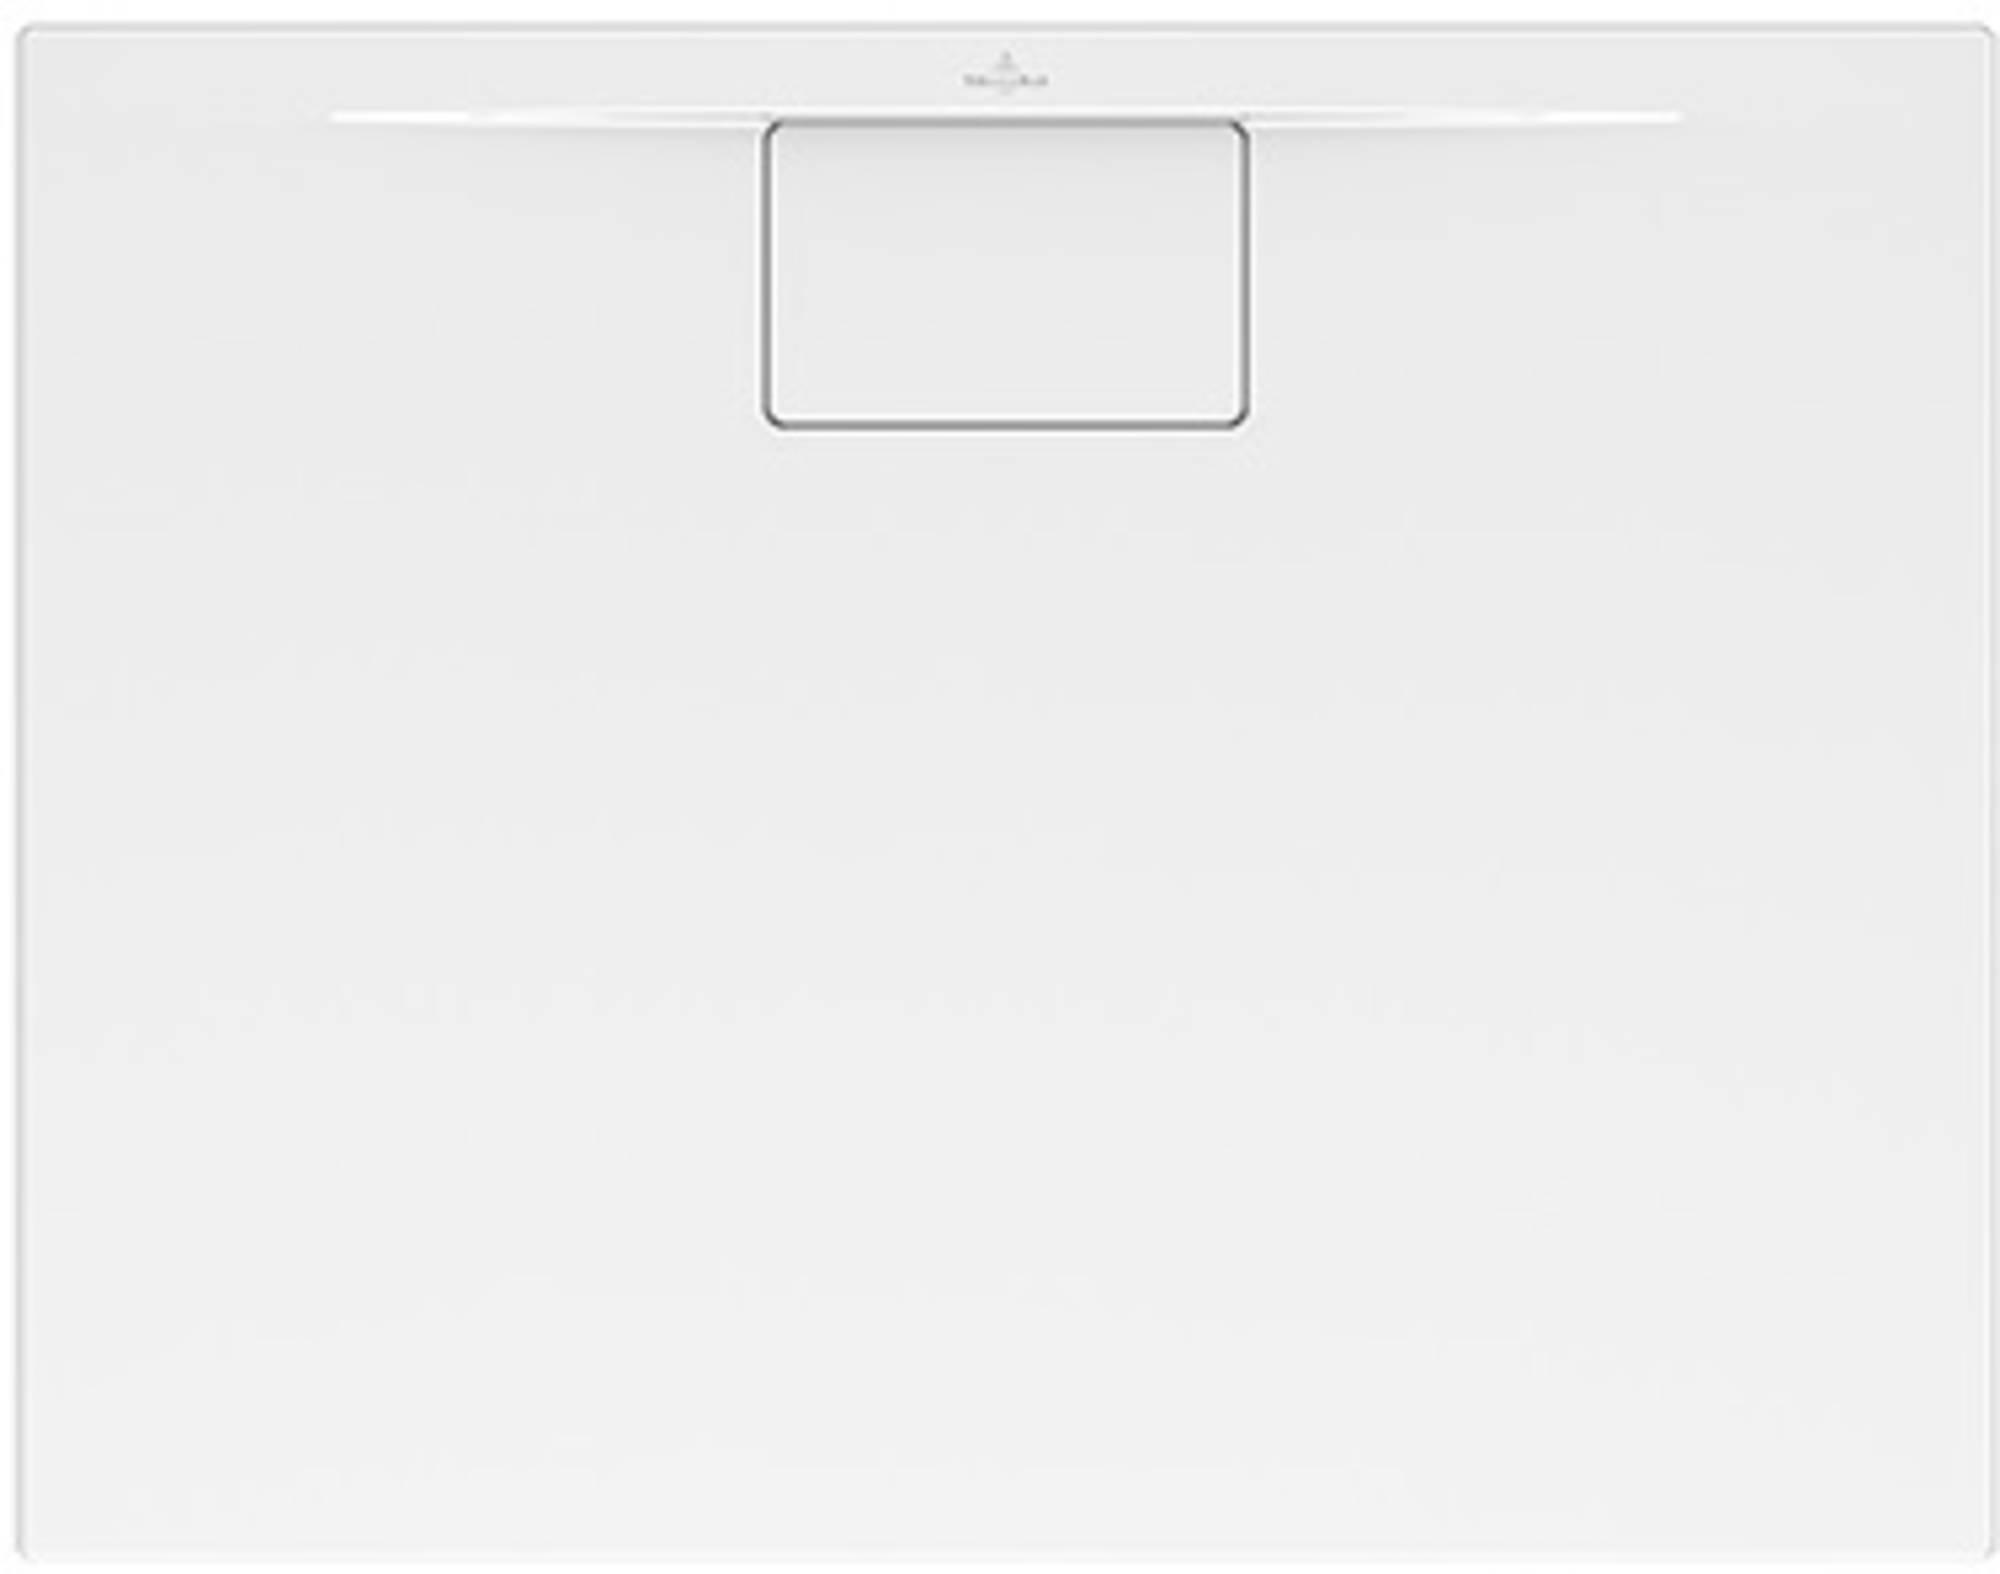 Villeroy & boch Architectura metal rim douchebak 120x80x1.5 cm, wit